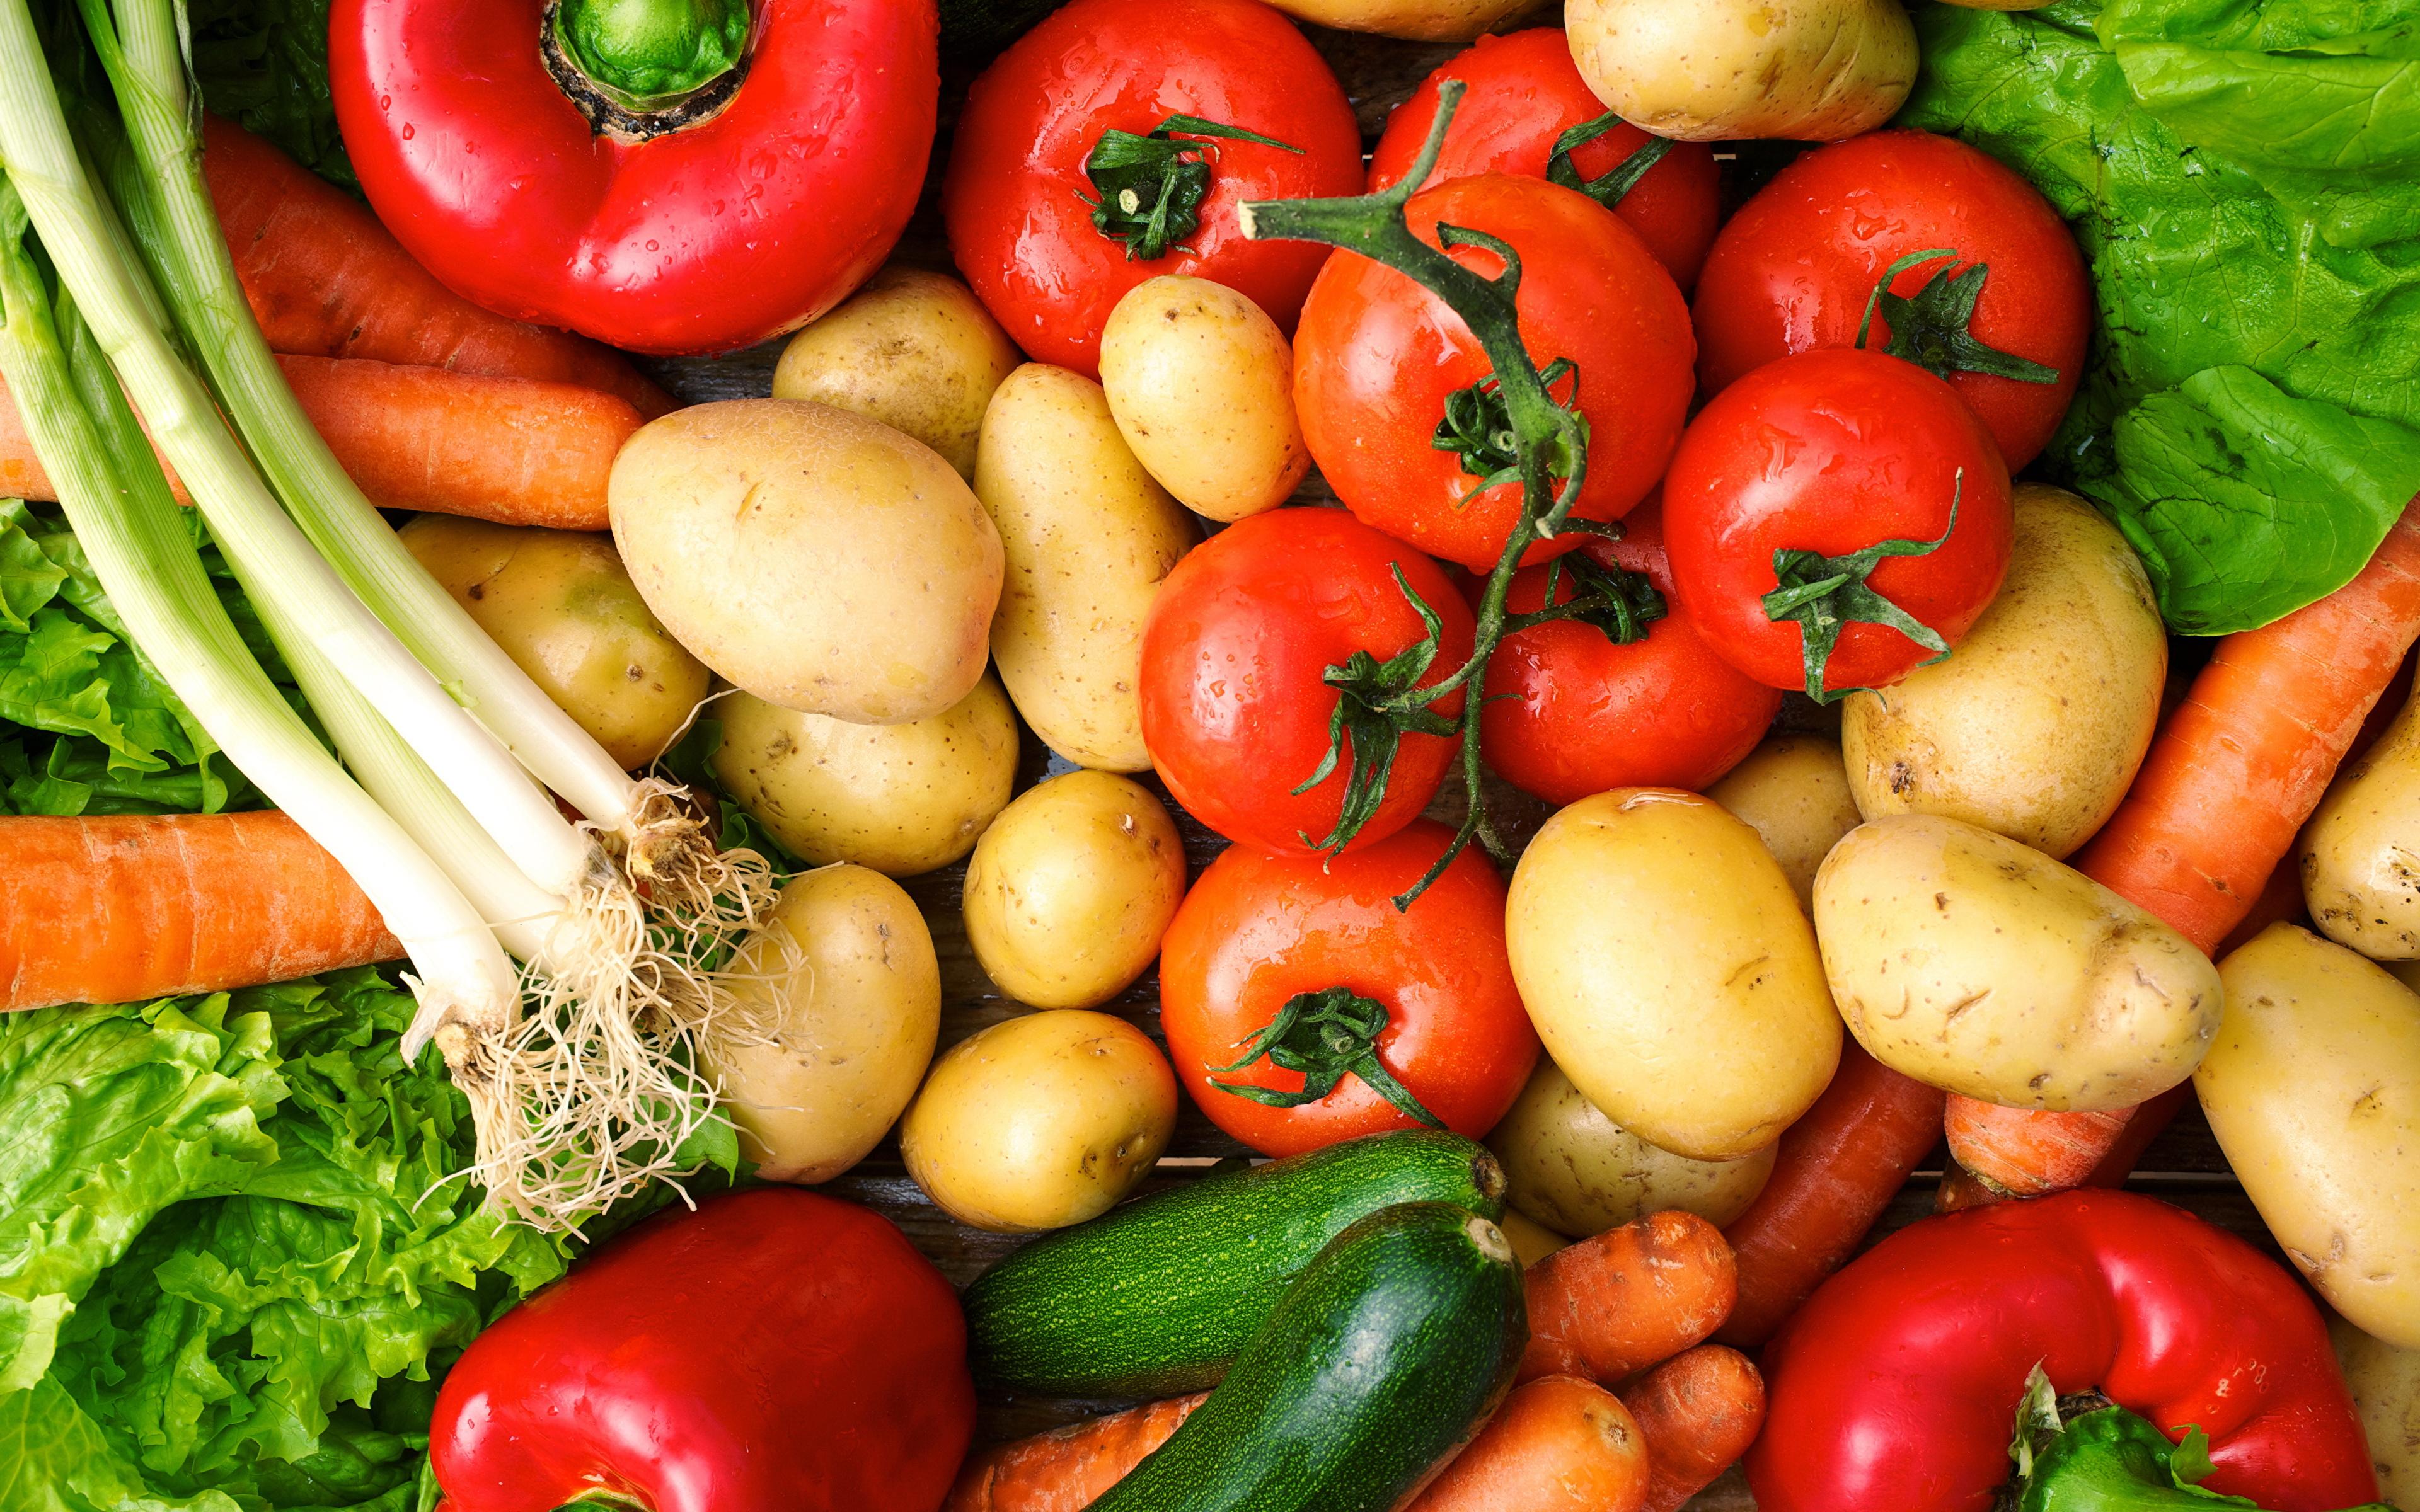 Картинка Помидоры морковка Картофель Лук репчатый Овощи Продукты питания 3840x2400 Томаты Морковь картошка Еда Пища